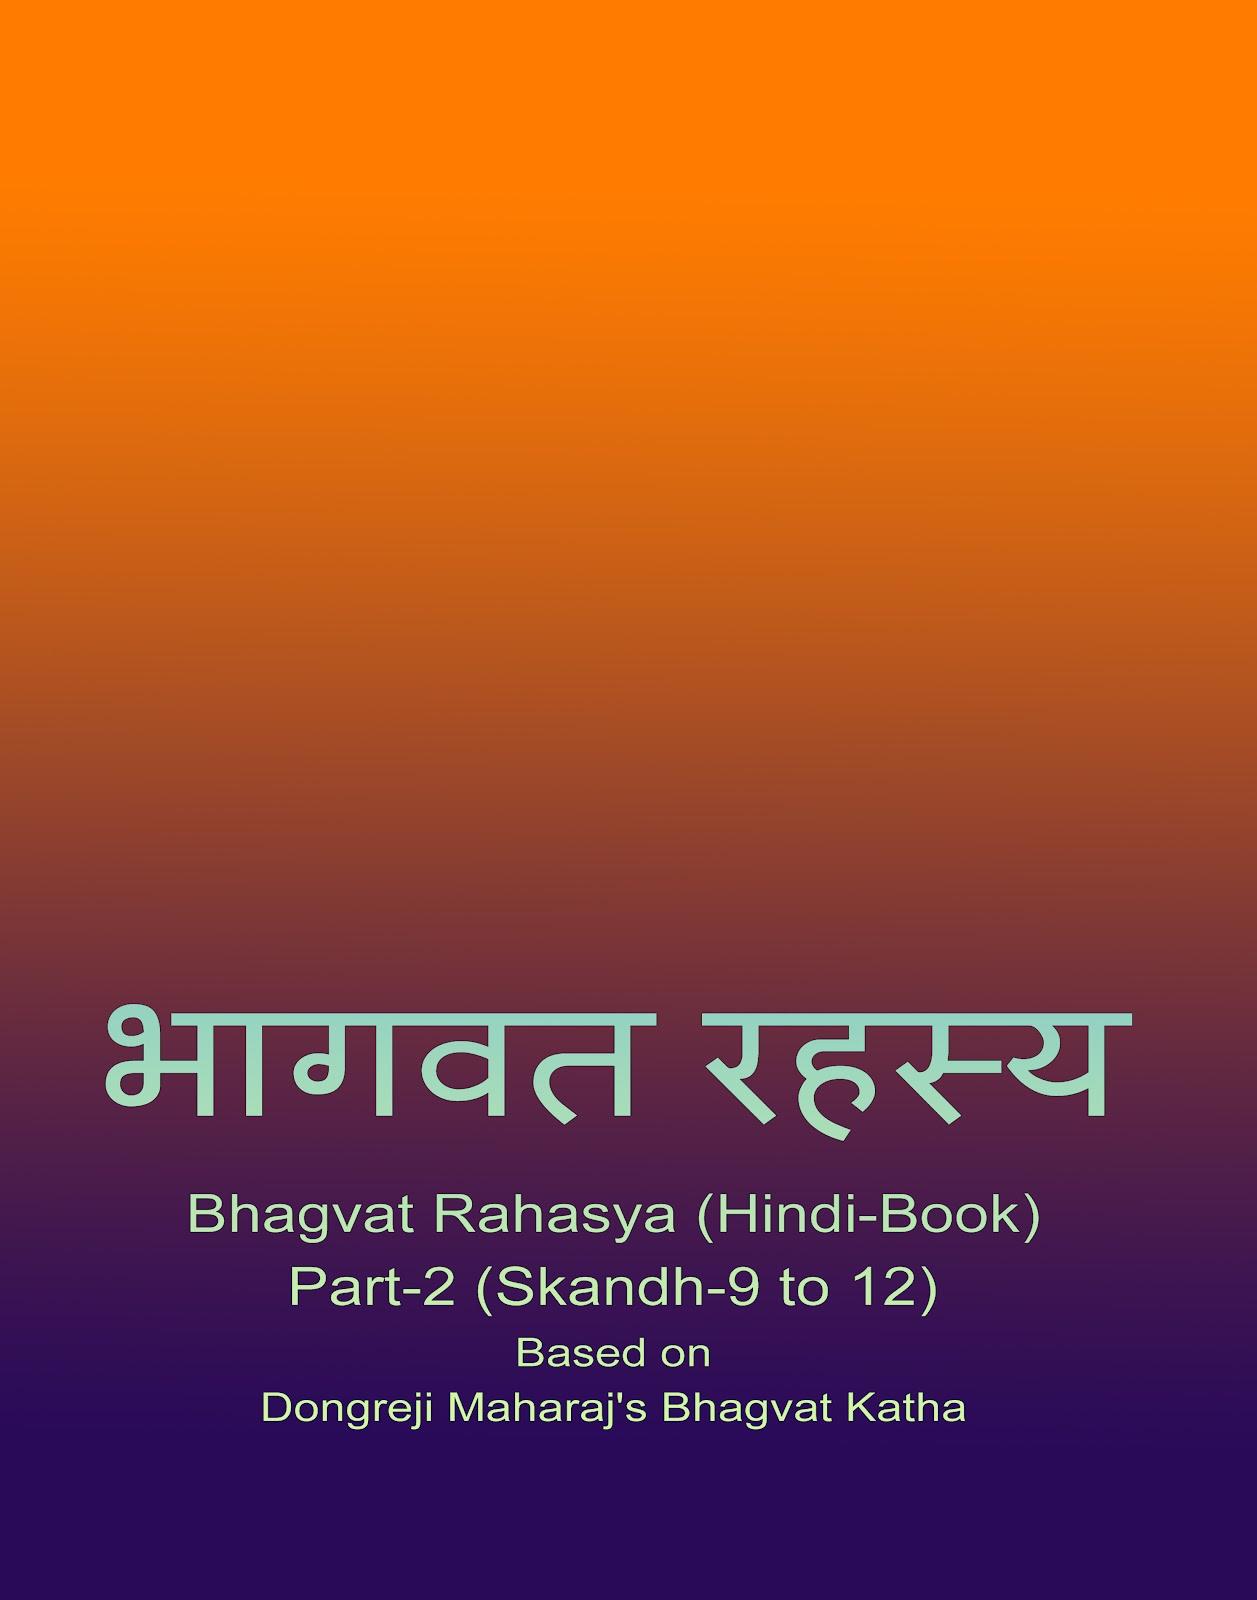 Hindi Bhagvat rahasya-title page copy.jpg